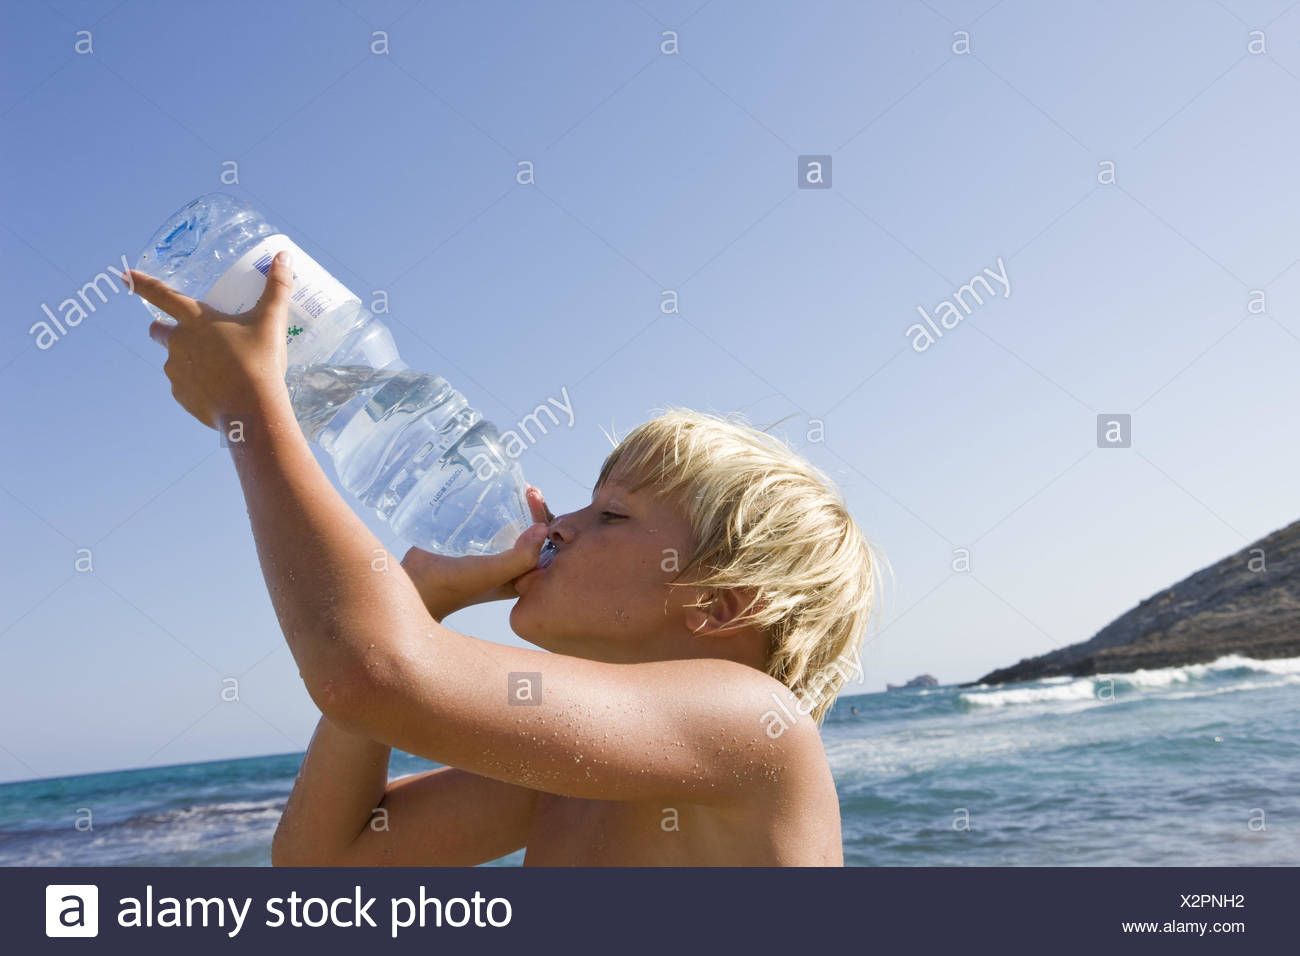 Beach, boy, thirsty, water bottle, drinking, portrait, side view, people, children, blond, summer holidays, holidays, sunny, heat, hot, thirst, drink, bottle, water, sea, mineral water, - Stock Image